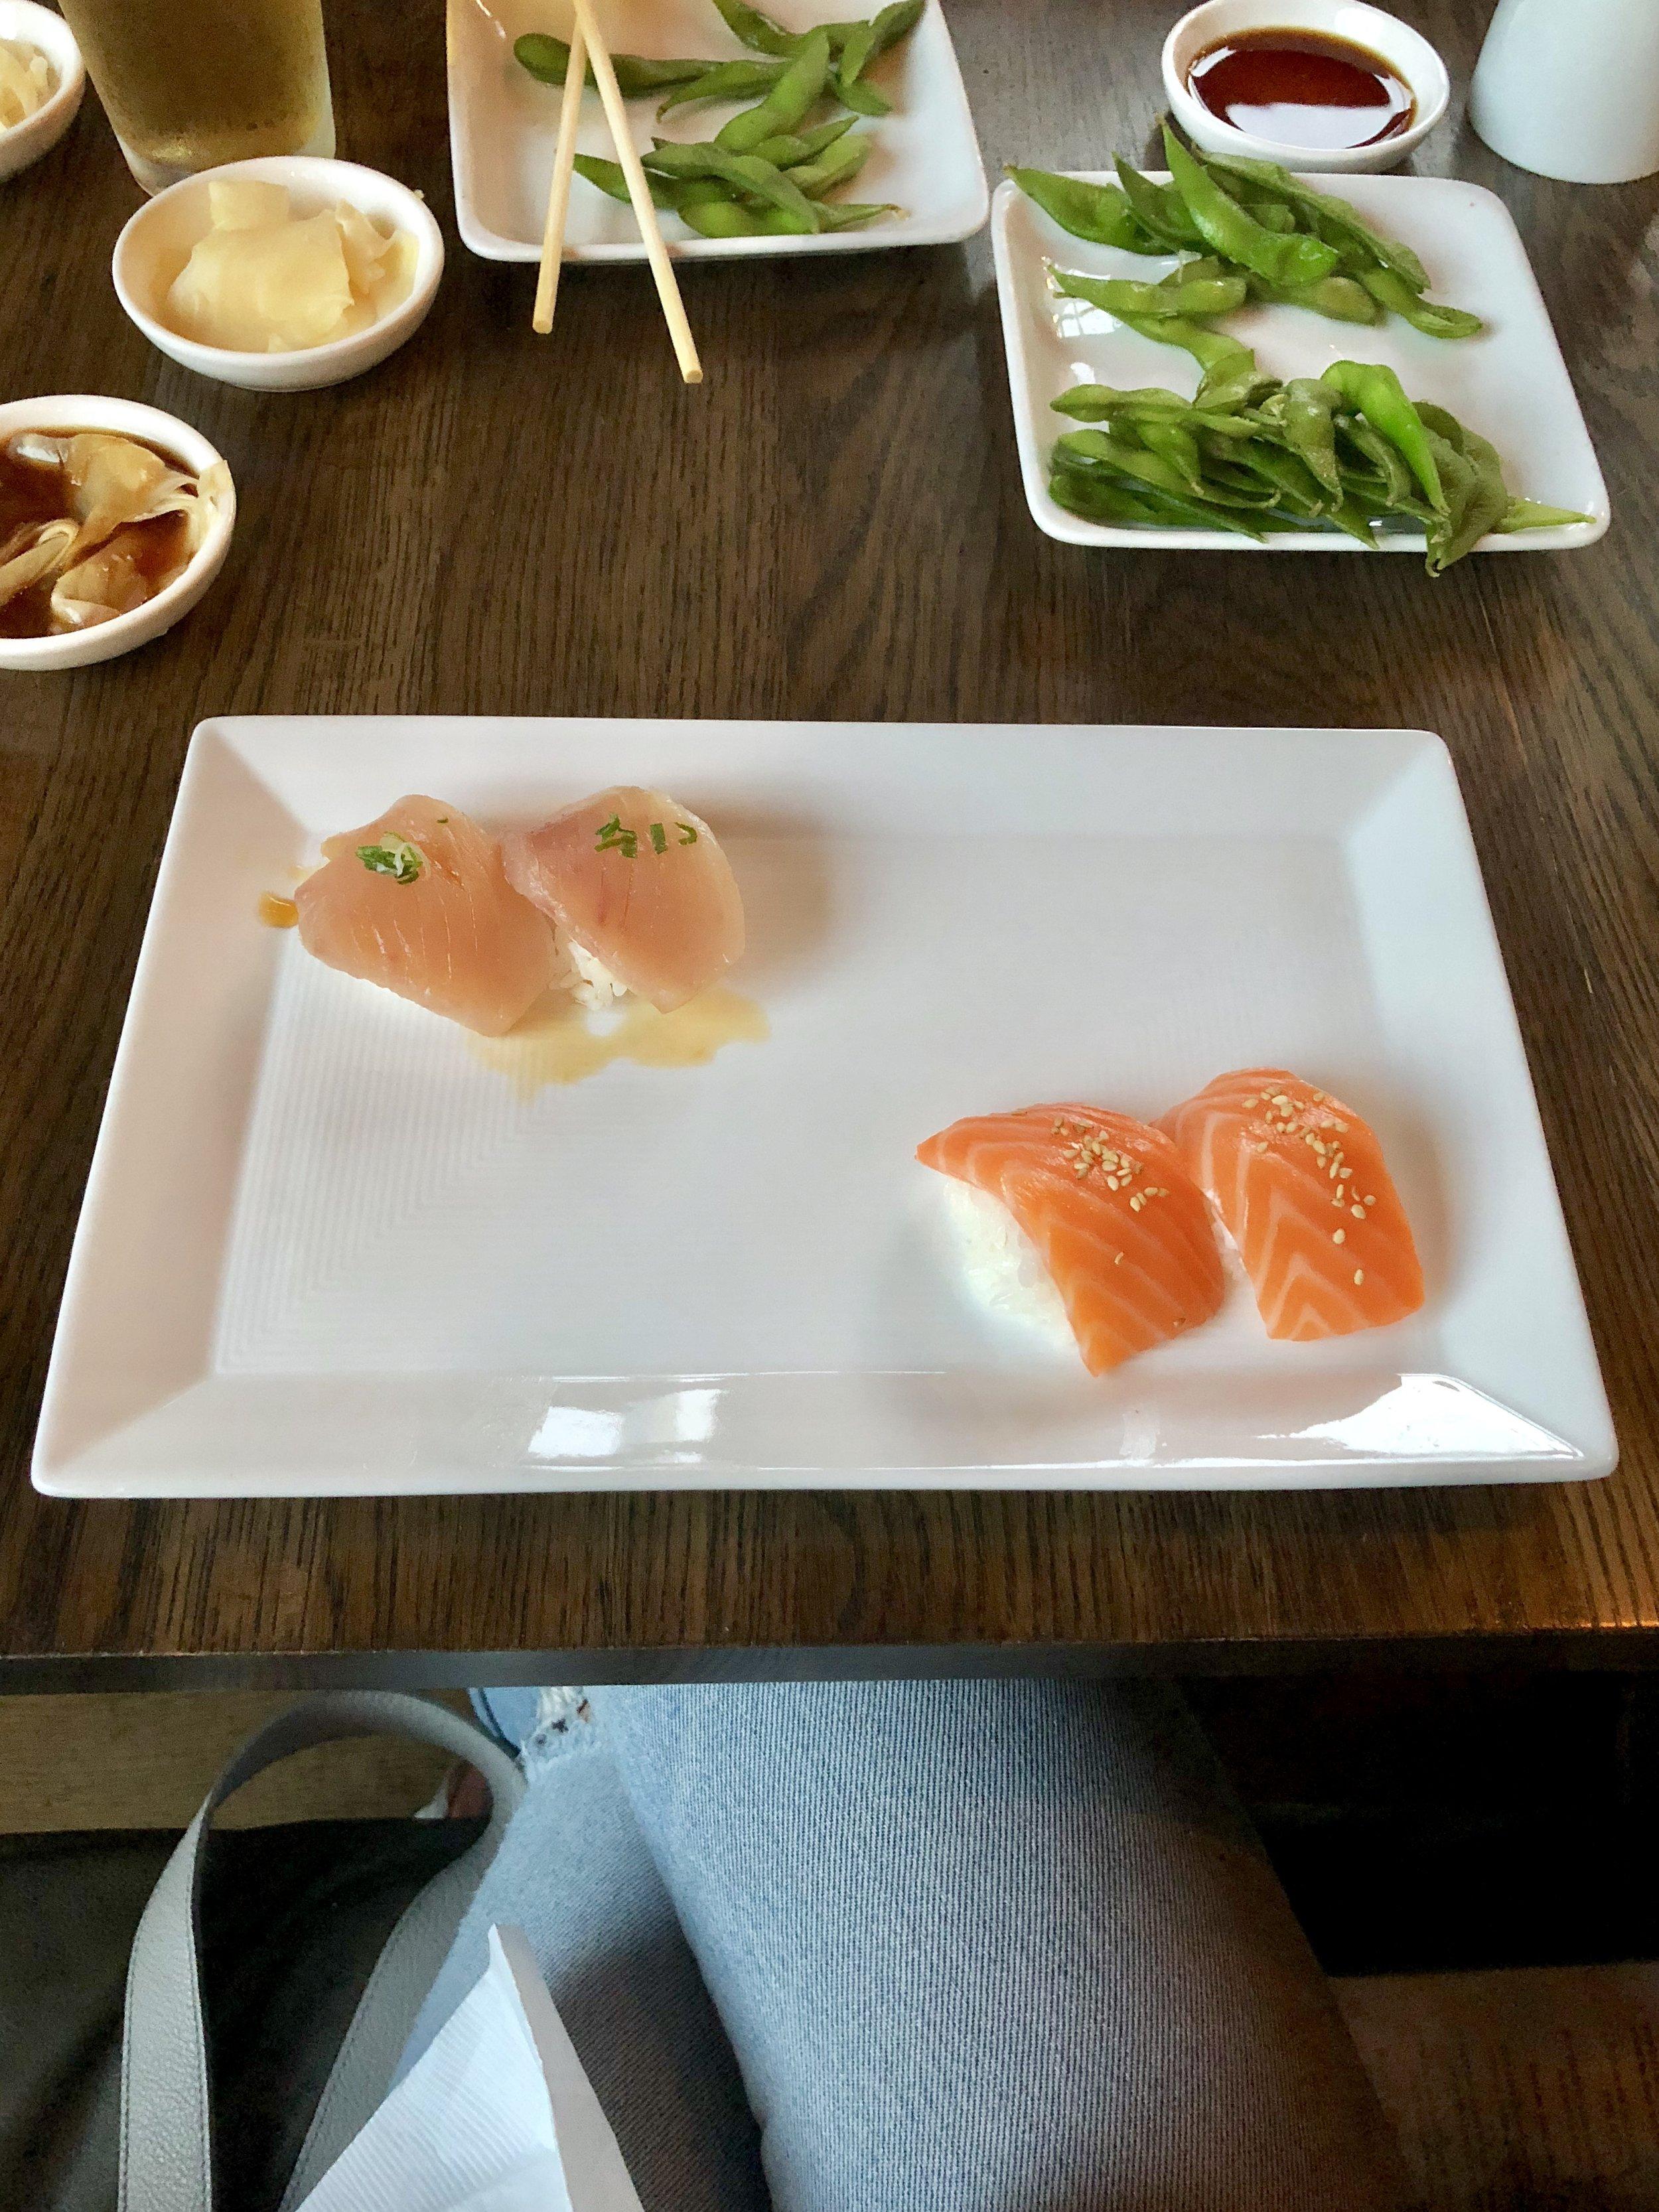 albacore and salmon sushi